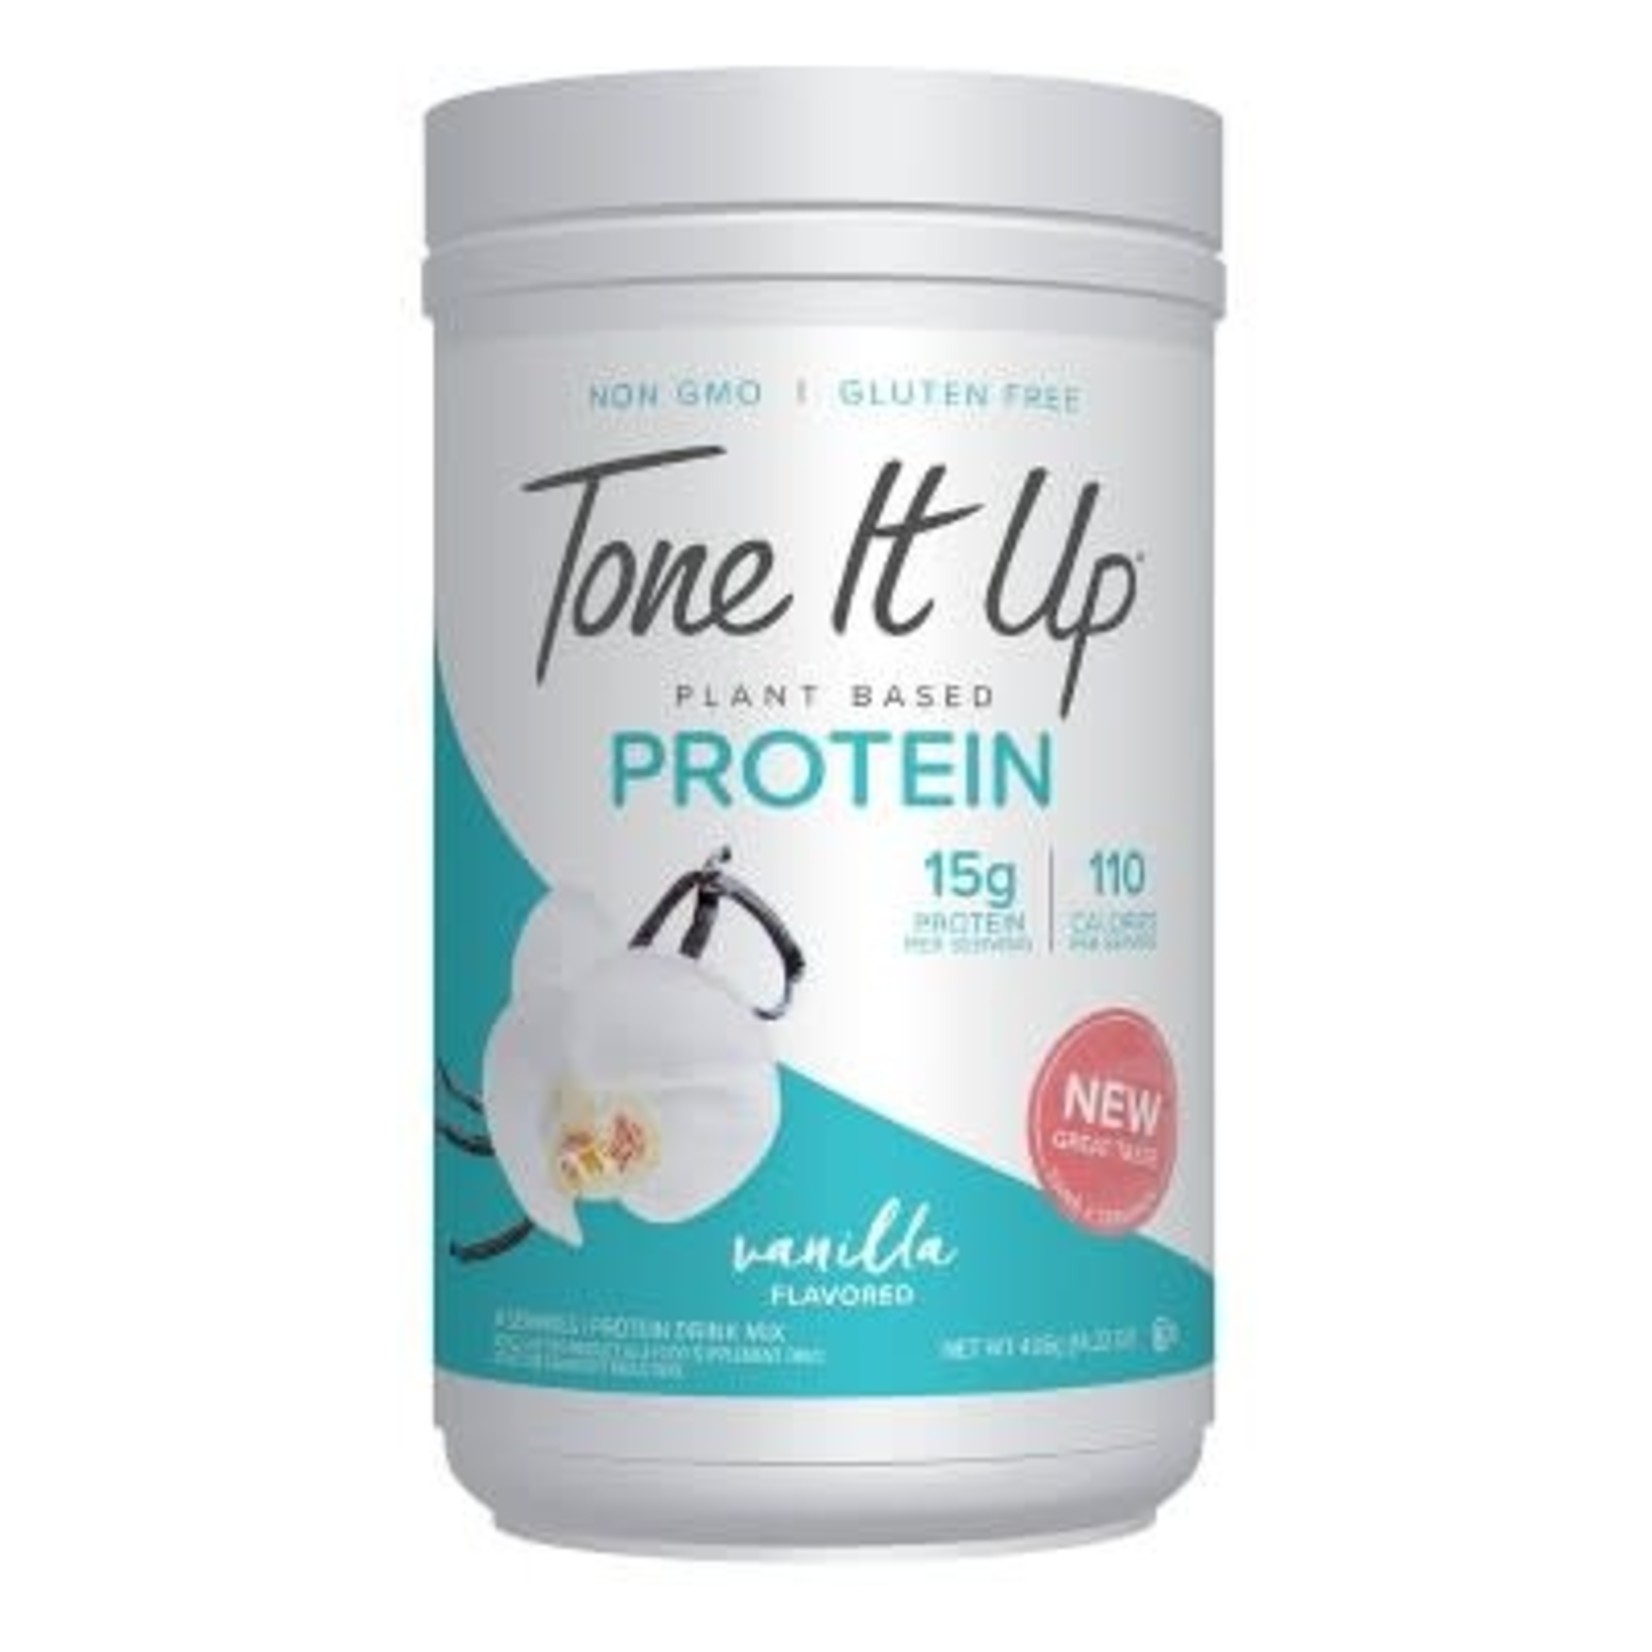 Tone It Up Plant Based Protein Powder - Vanilla - 14.82oz